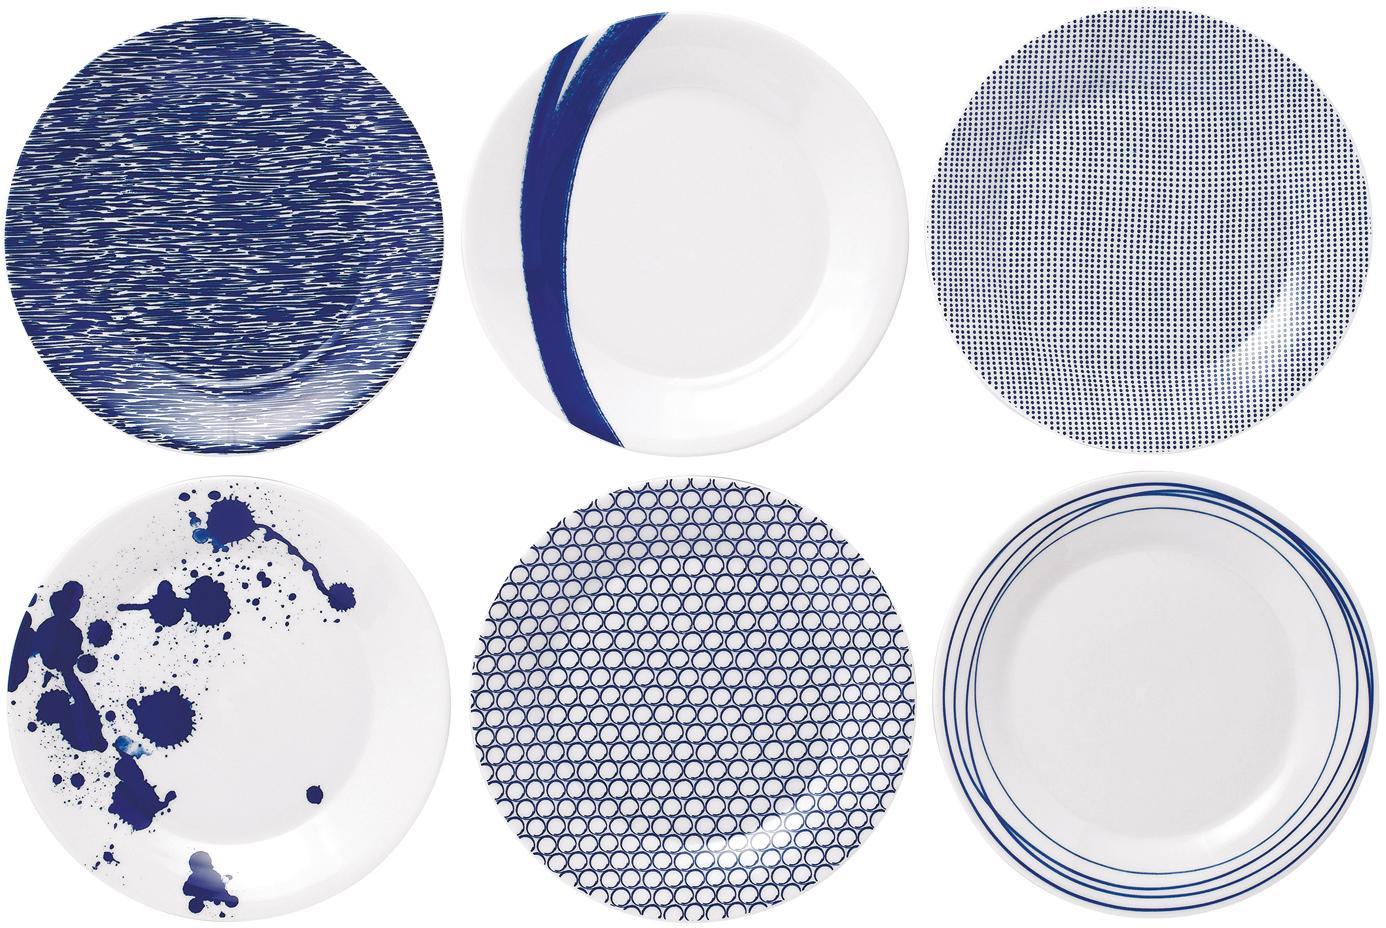 Porseleinen ontbijtborden Pacific met patroon, 6-delig, Porselein, Wit, blauw, Ø 23 cm